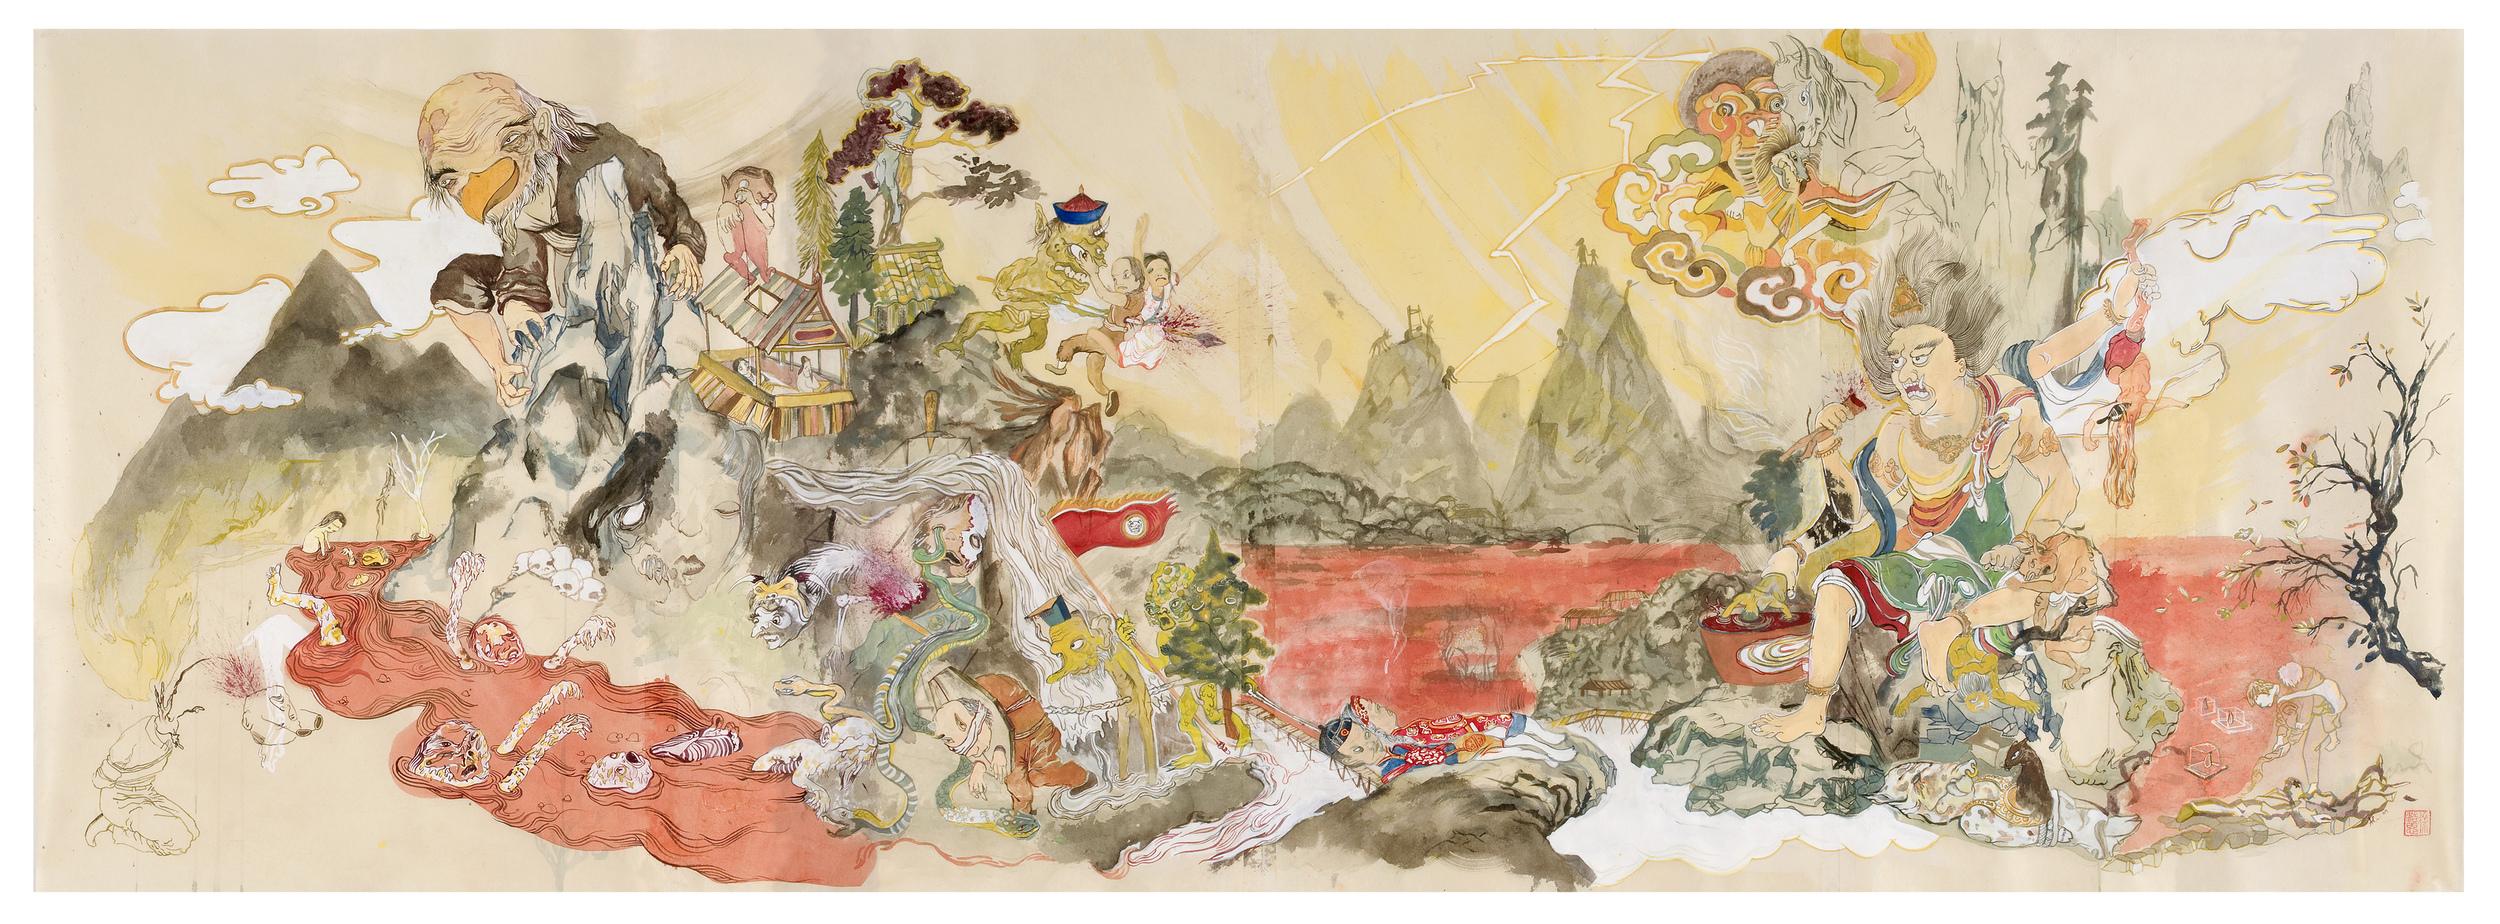 Howie Tsui 徐浩恩, Tengu's World 天狗的世界, 2009,  ink and paint pigment on mulberry paper 桑皮纸、颜料与墨, 63 x 188 cm